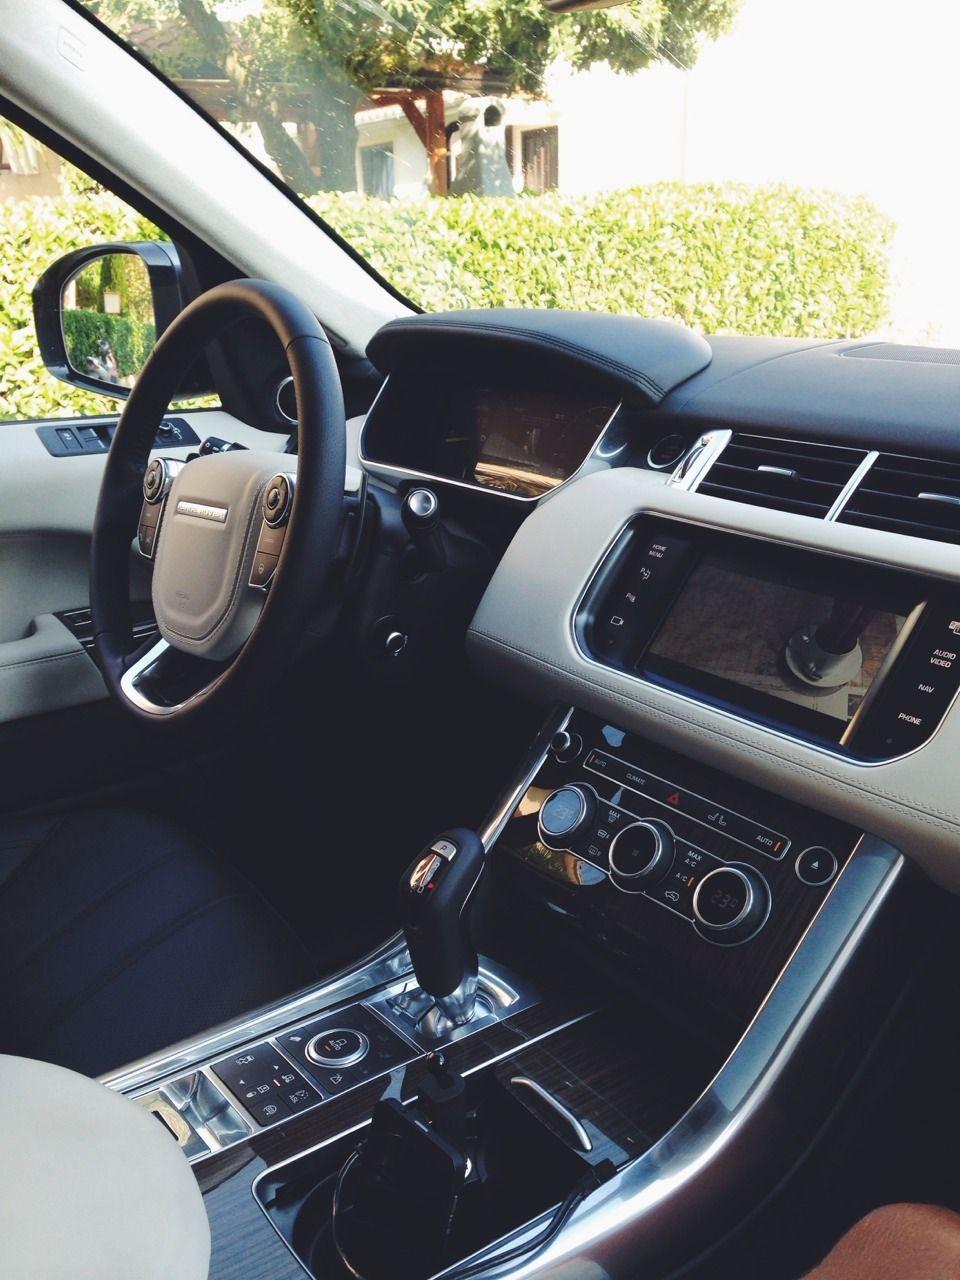 Range Rover 🚘|تجميعي💙⚡ bntpal.com_154392227